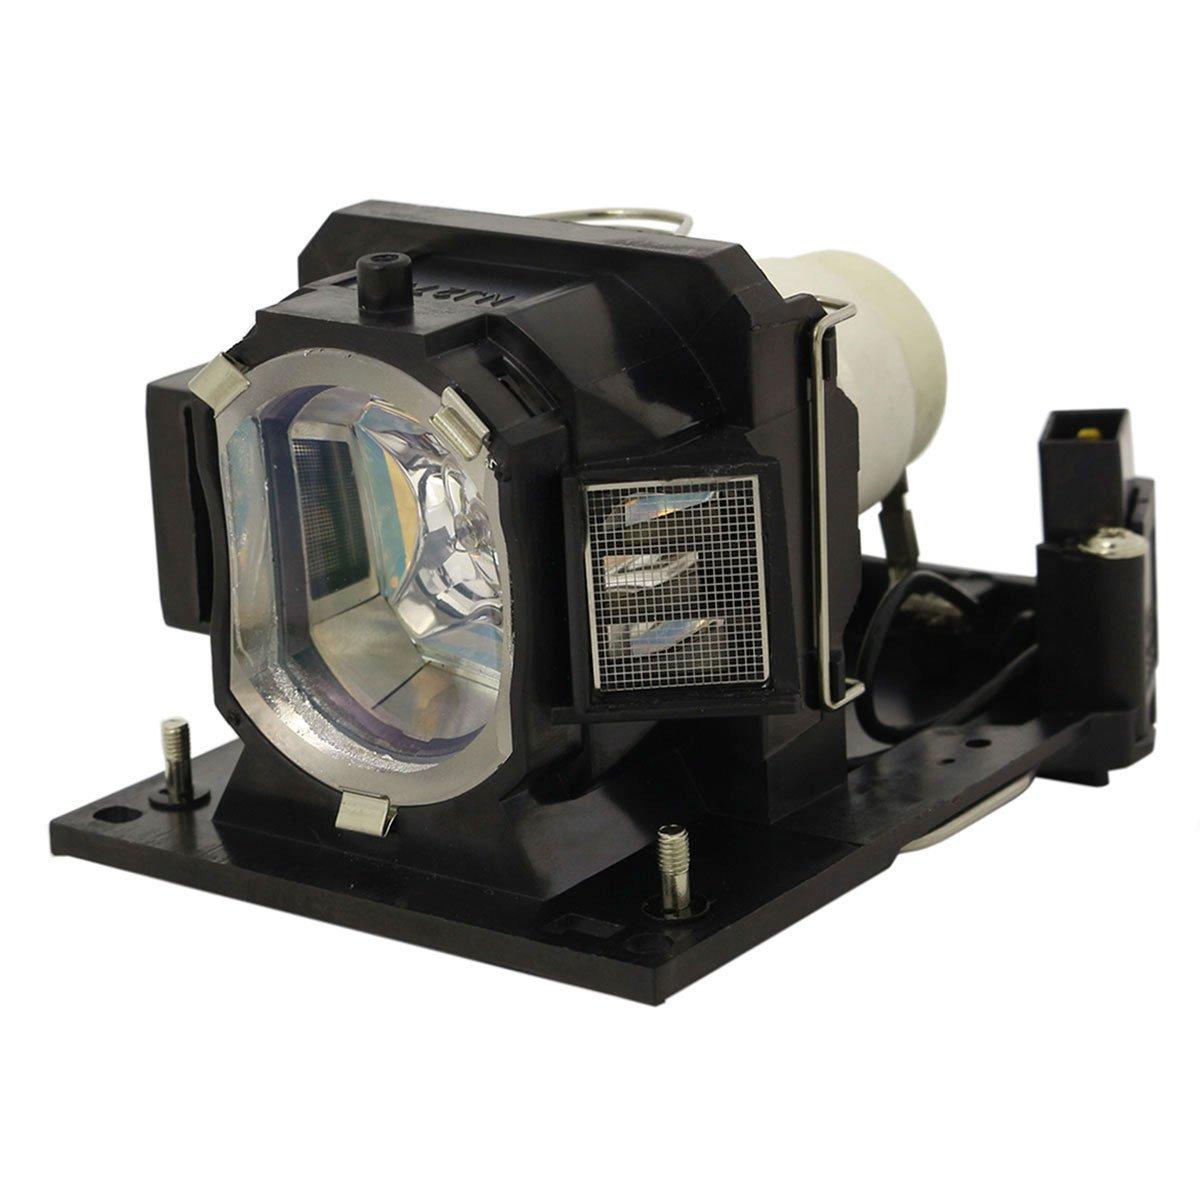 Lutema プロジェクター交換用ランプ ハウジング/電球付き 特殊機器ランプ用 TEQ-Z780M Economy Economy Lamp with Housing B07KTL4YJ1